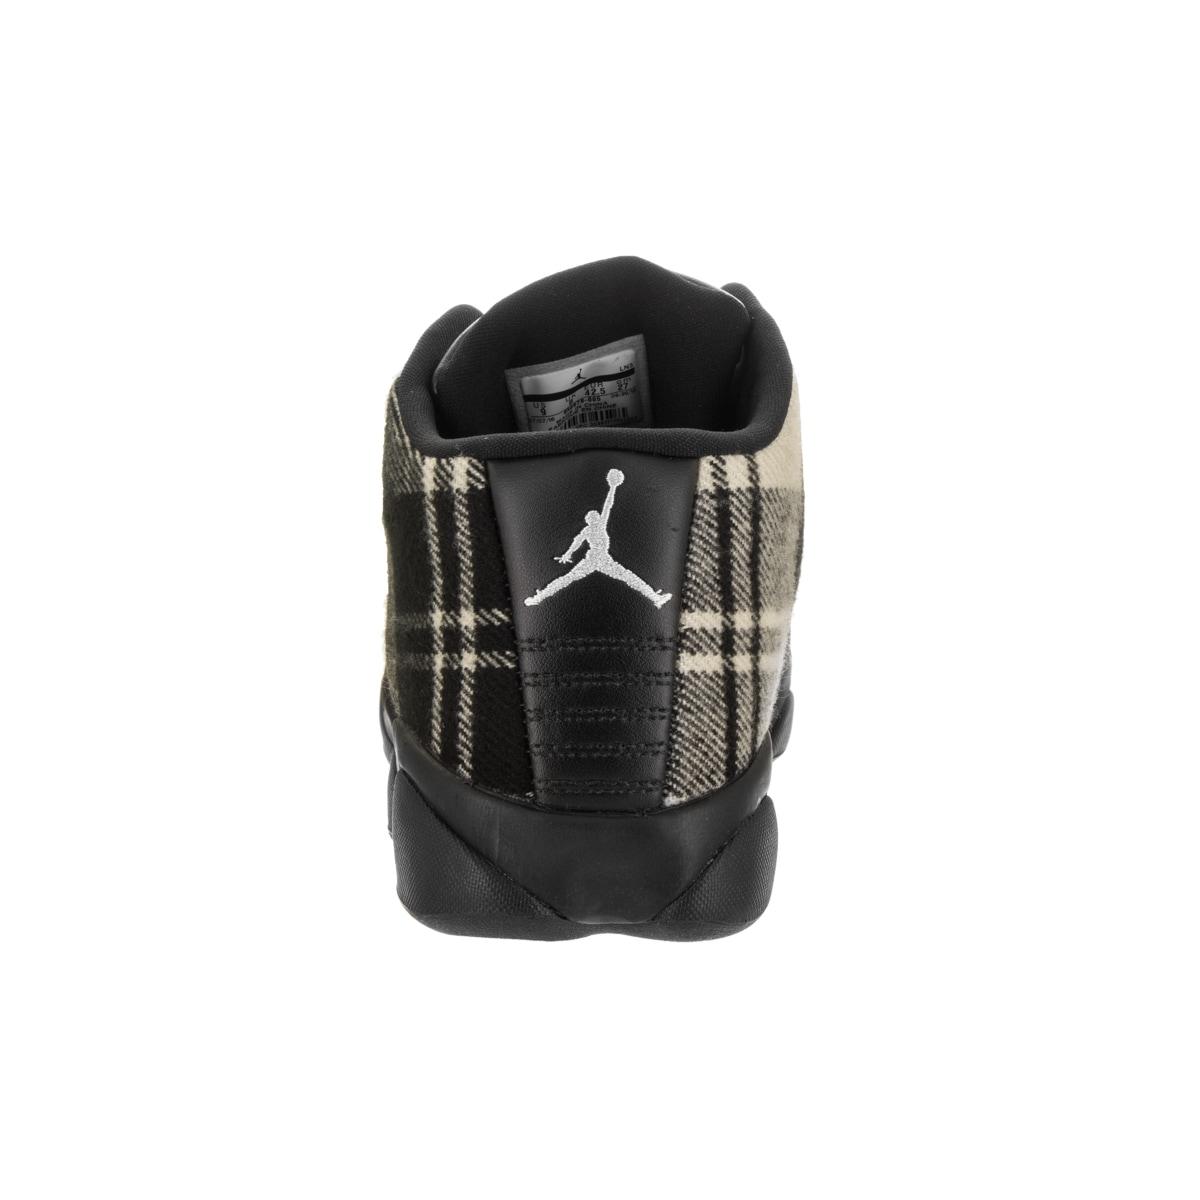 d56f82c32ff7 Shop Nike Men s Jordan Horizon Low Premium Black Leather Basketball Shoe -  Free Shipping Today - Overstock - 14746813